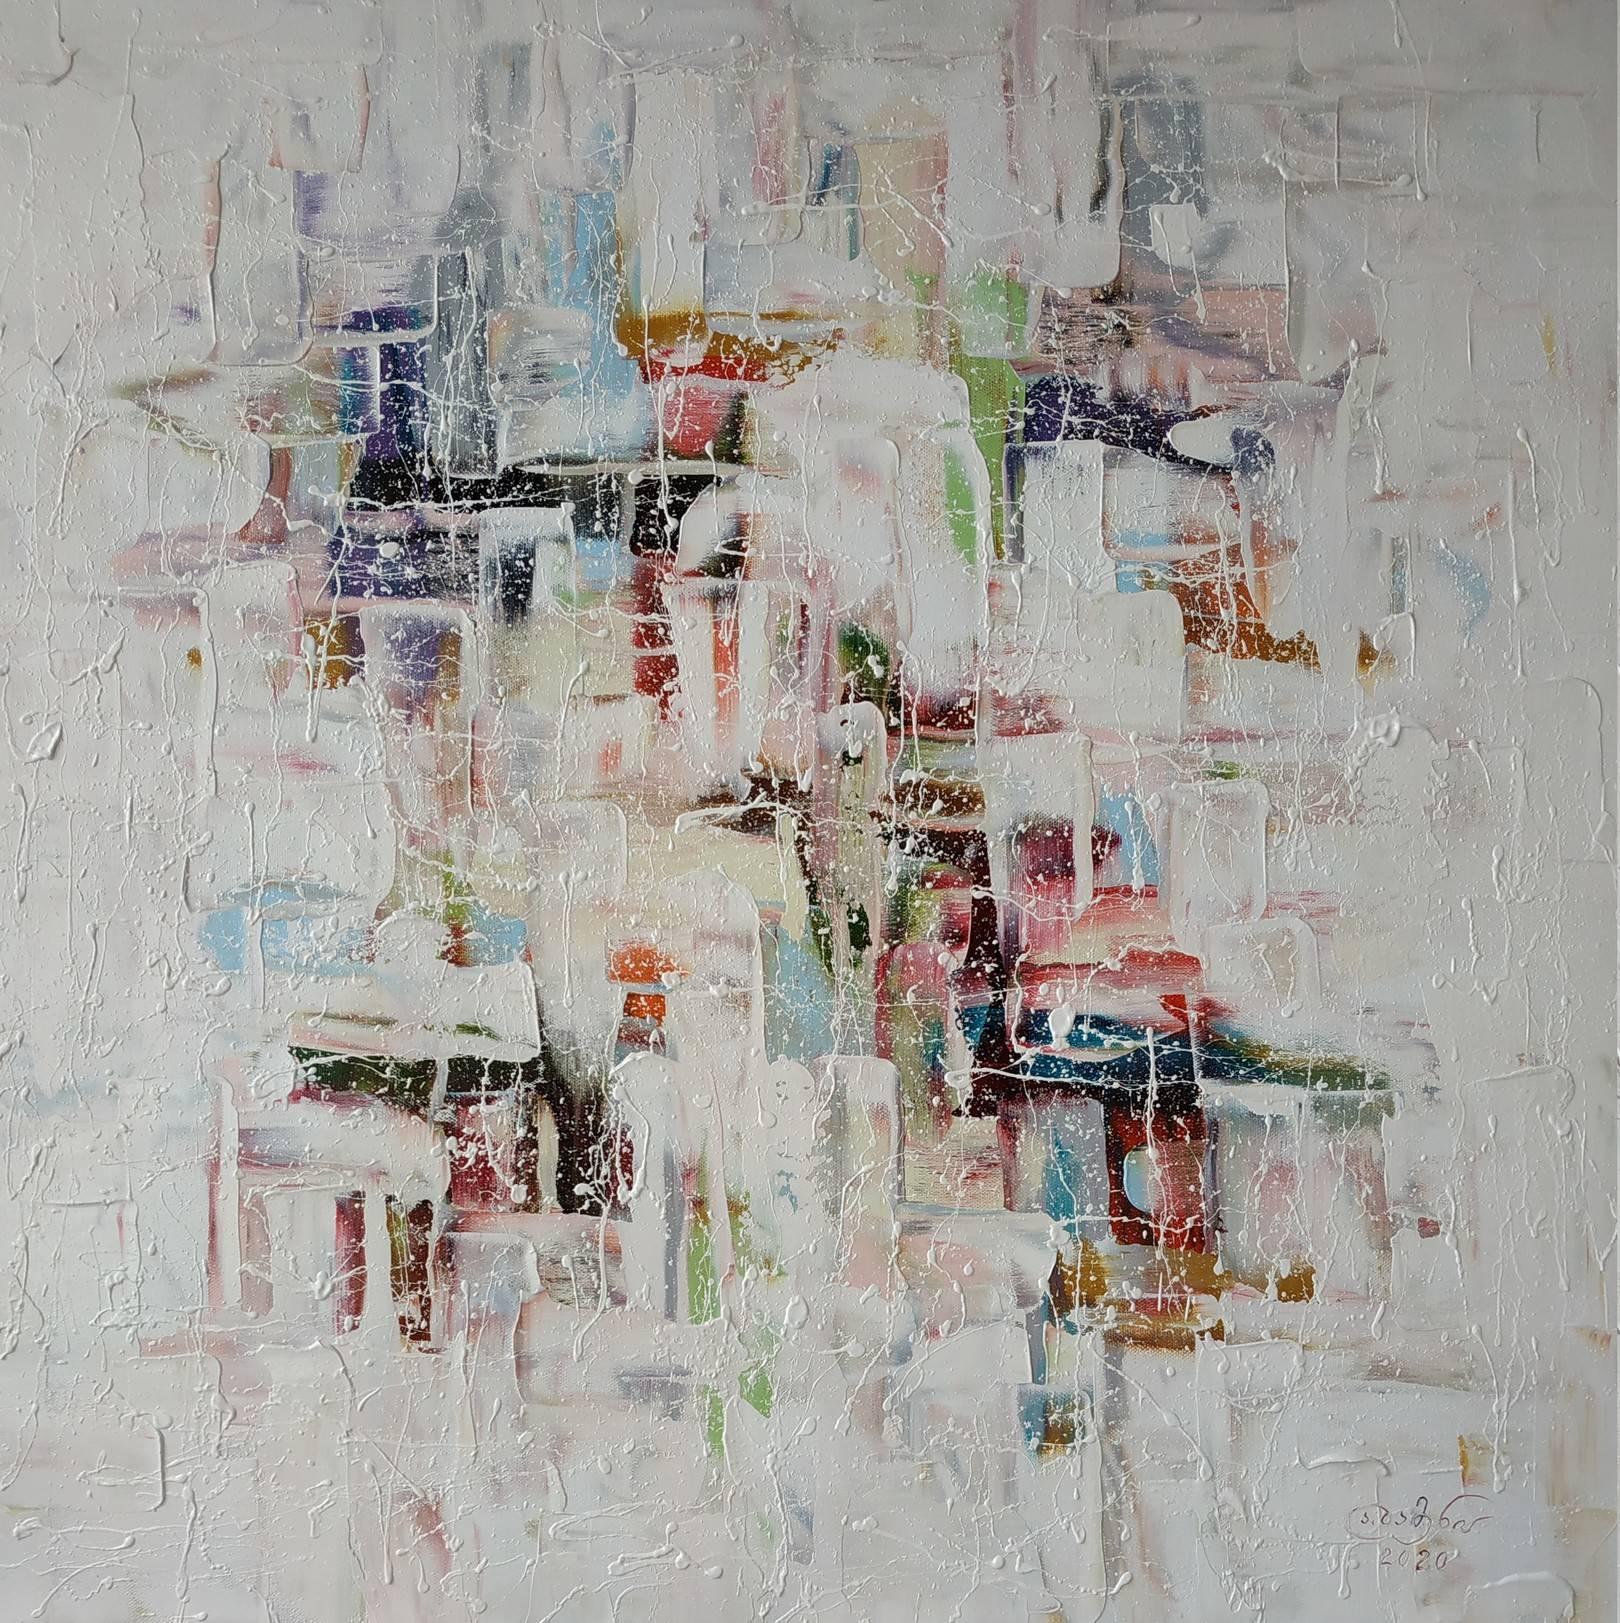 «Улицы после дождя — отражения»       холст, масло «Streets after rain - reflections»  oil on canvas                                                      80x80,  2020